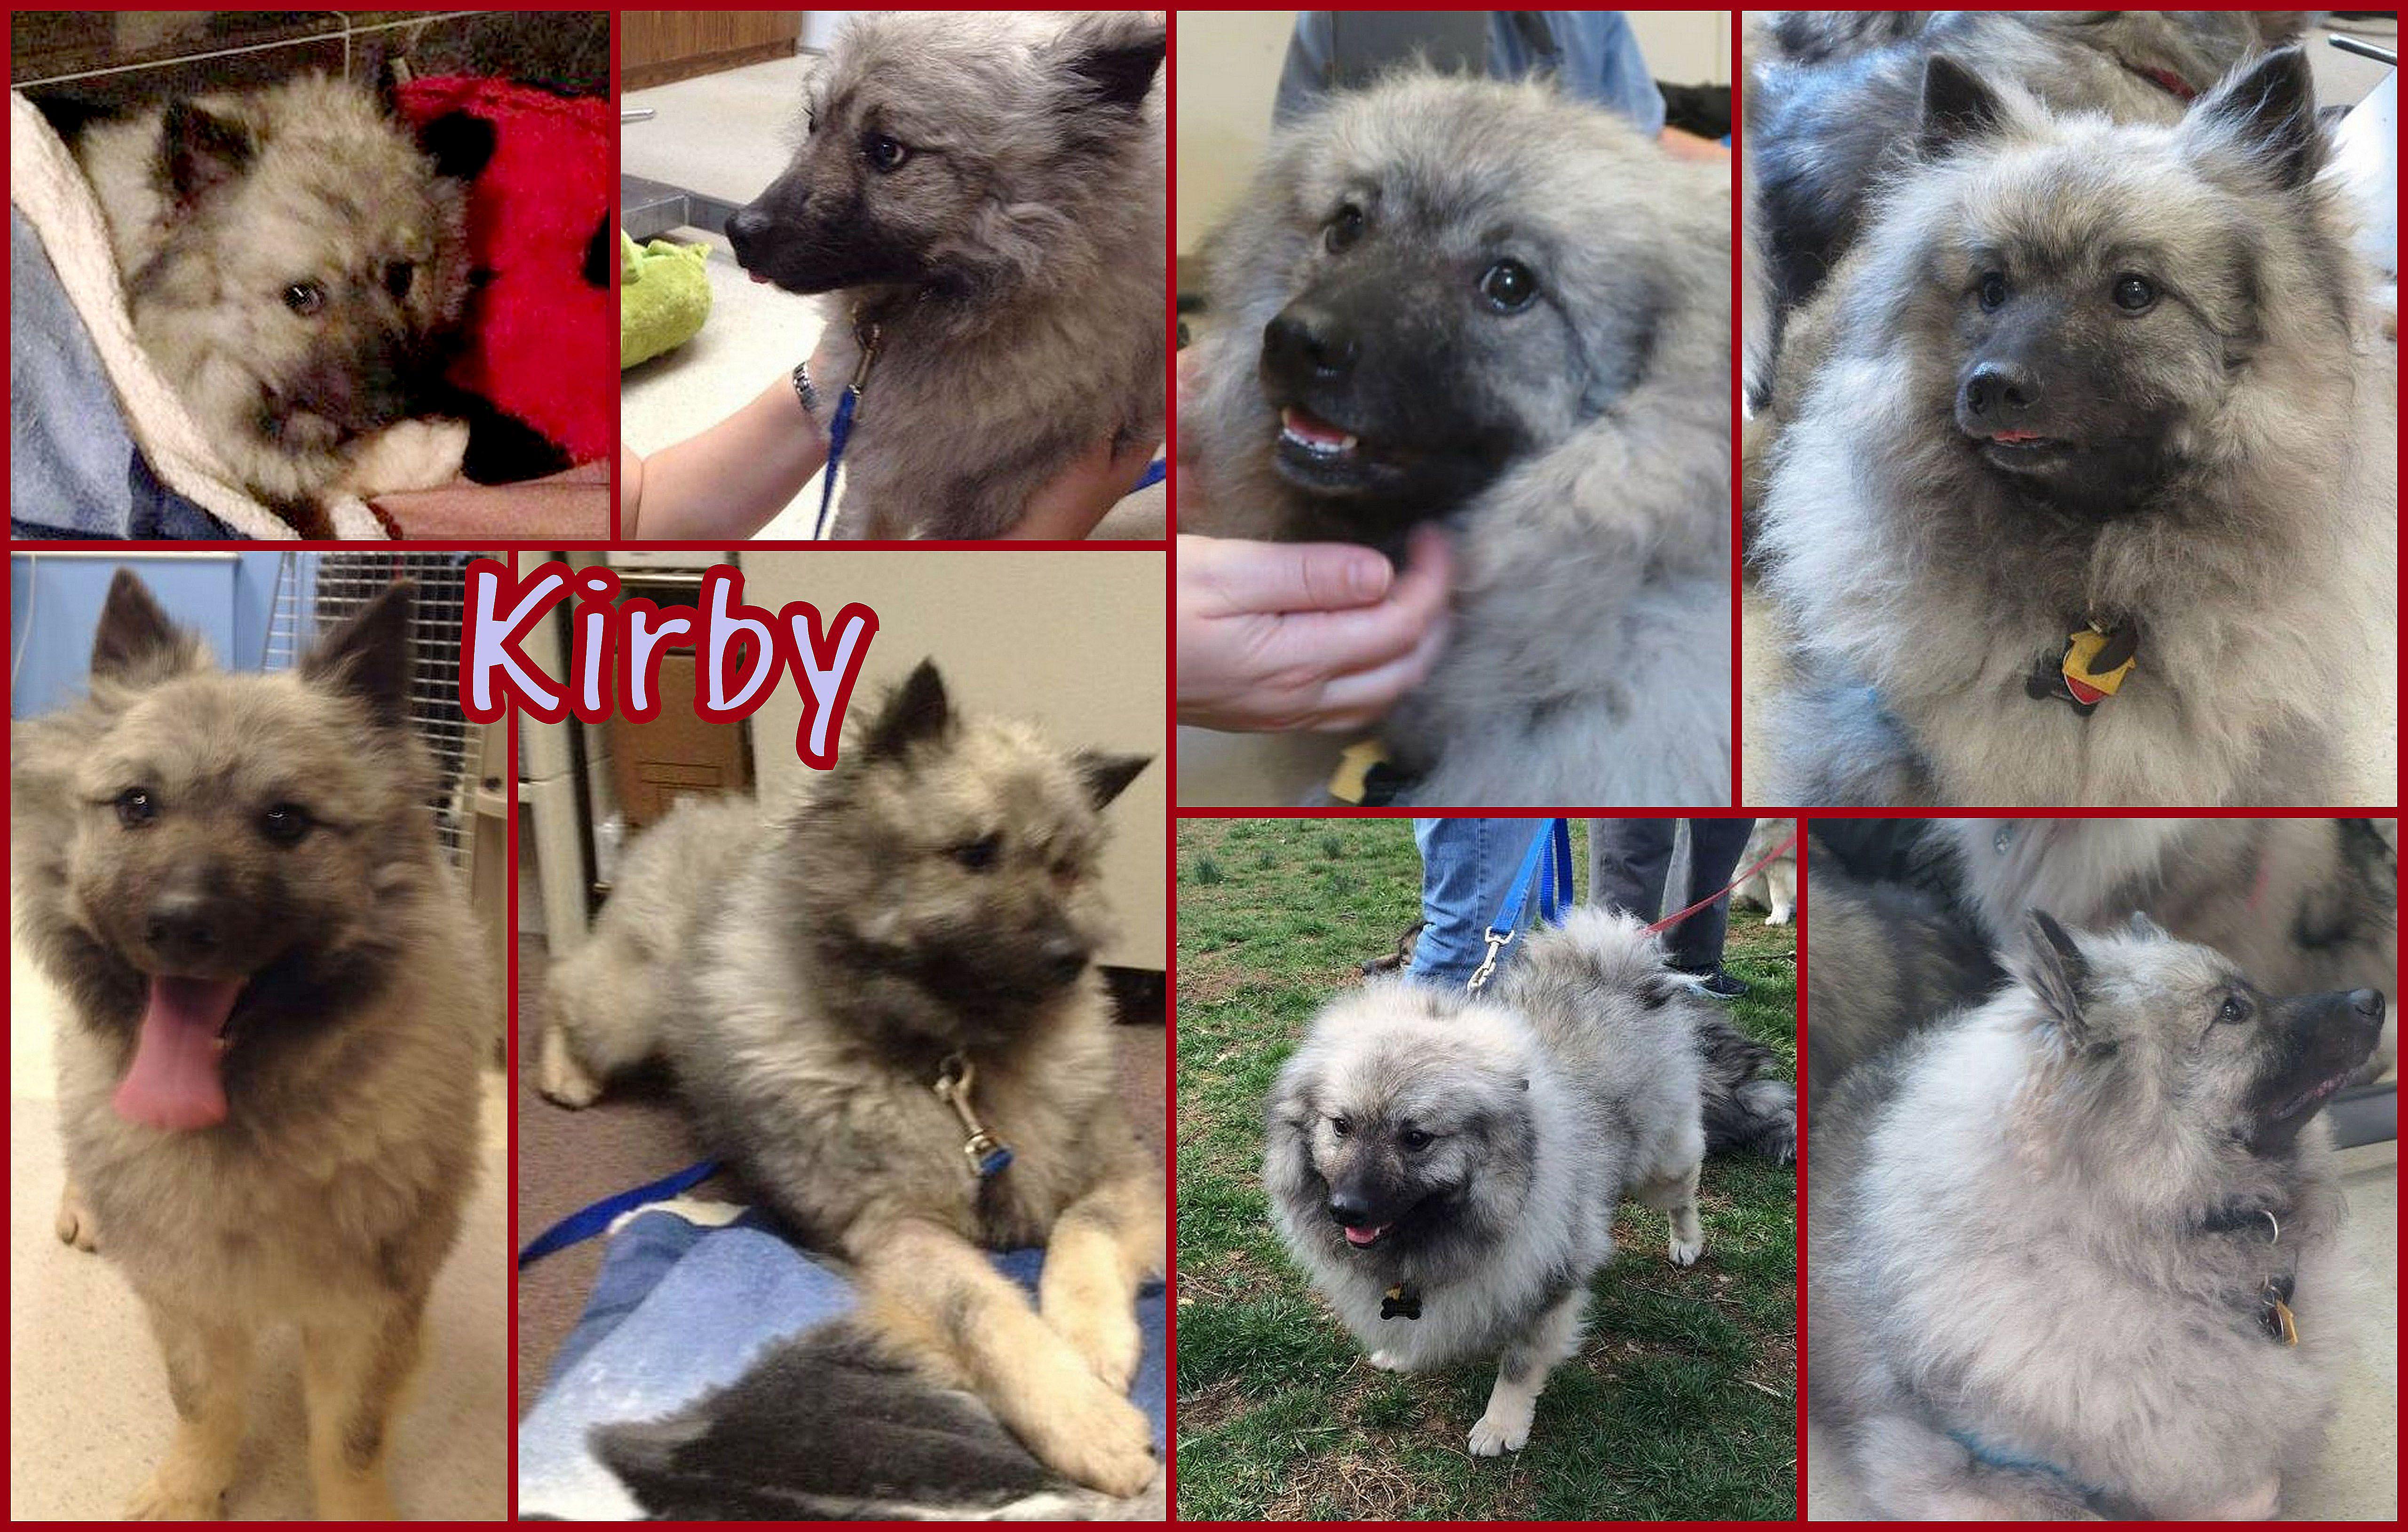 Comet-Kirby